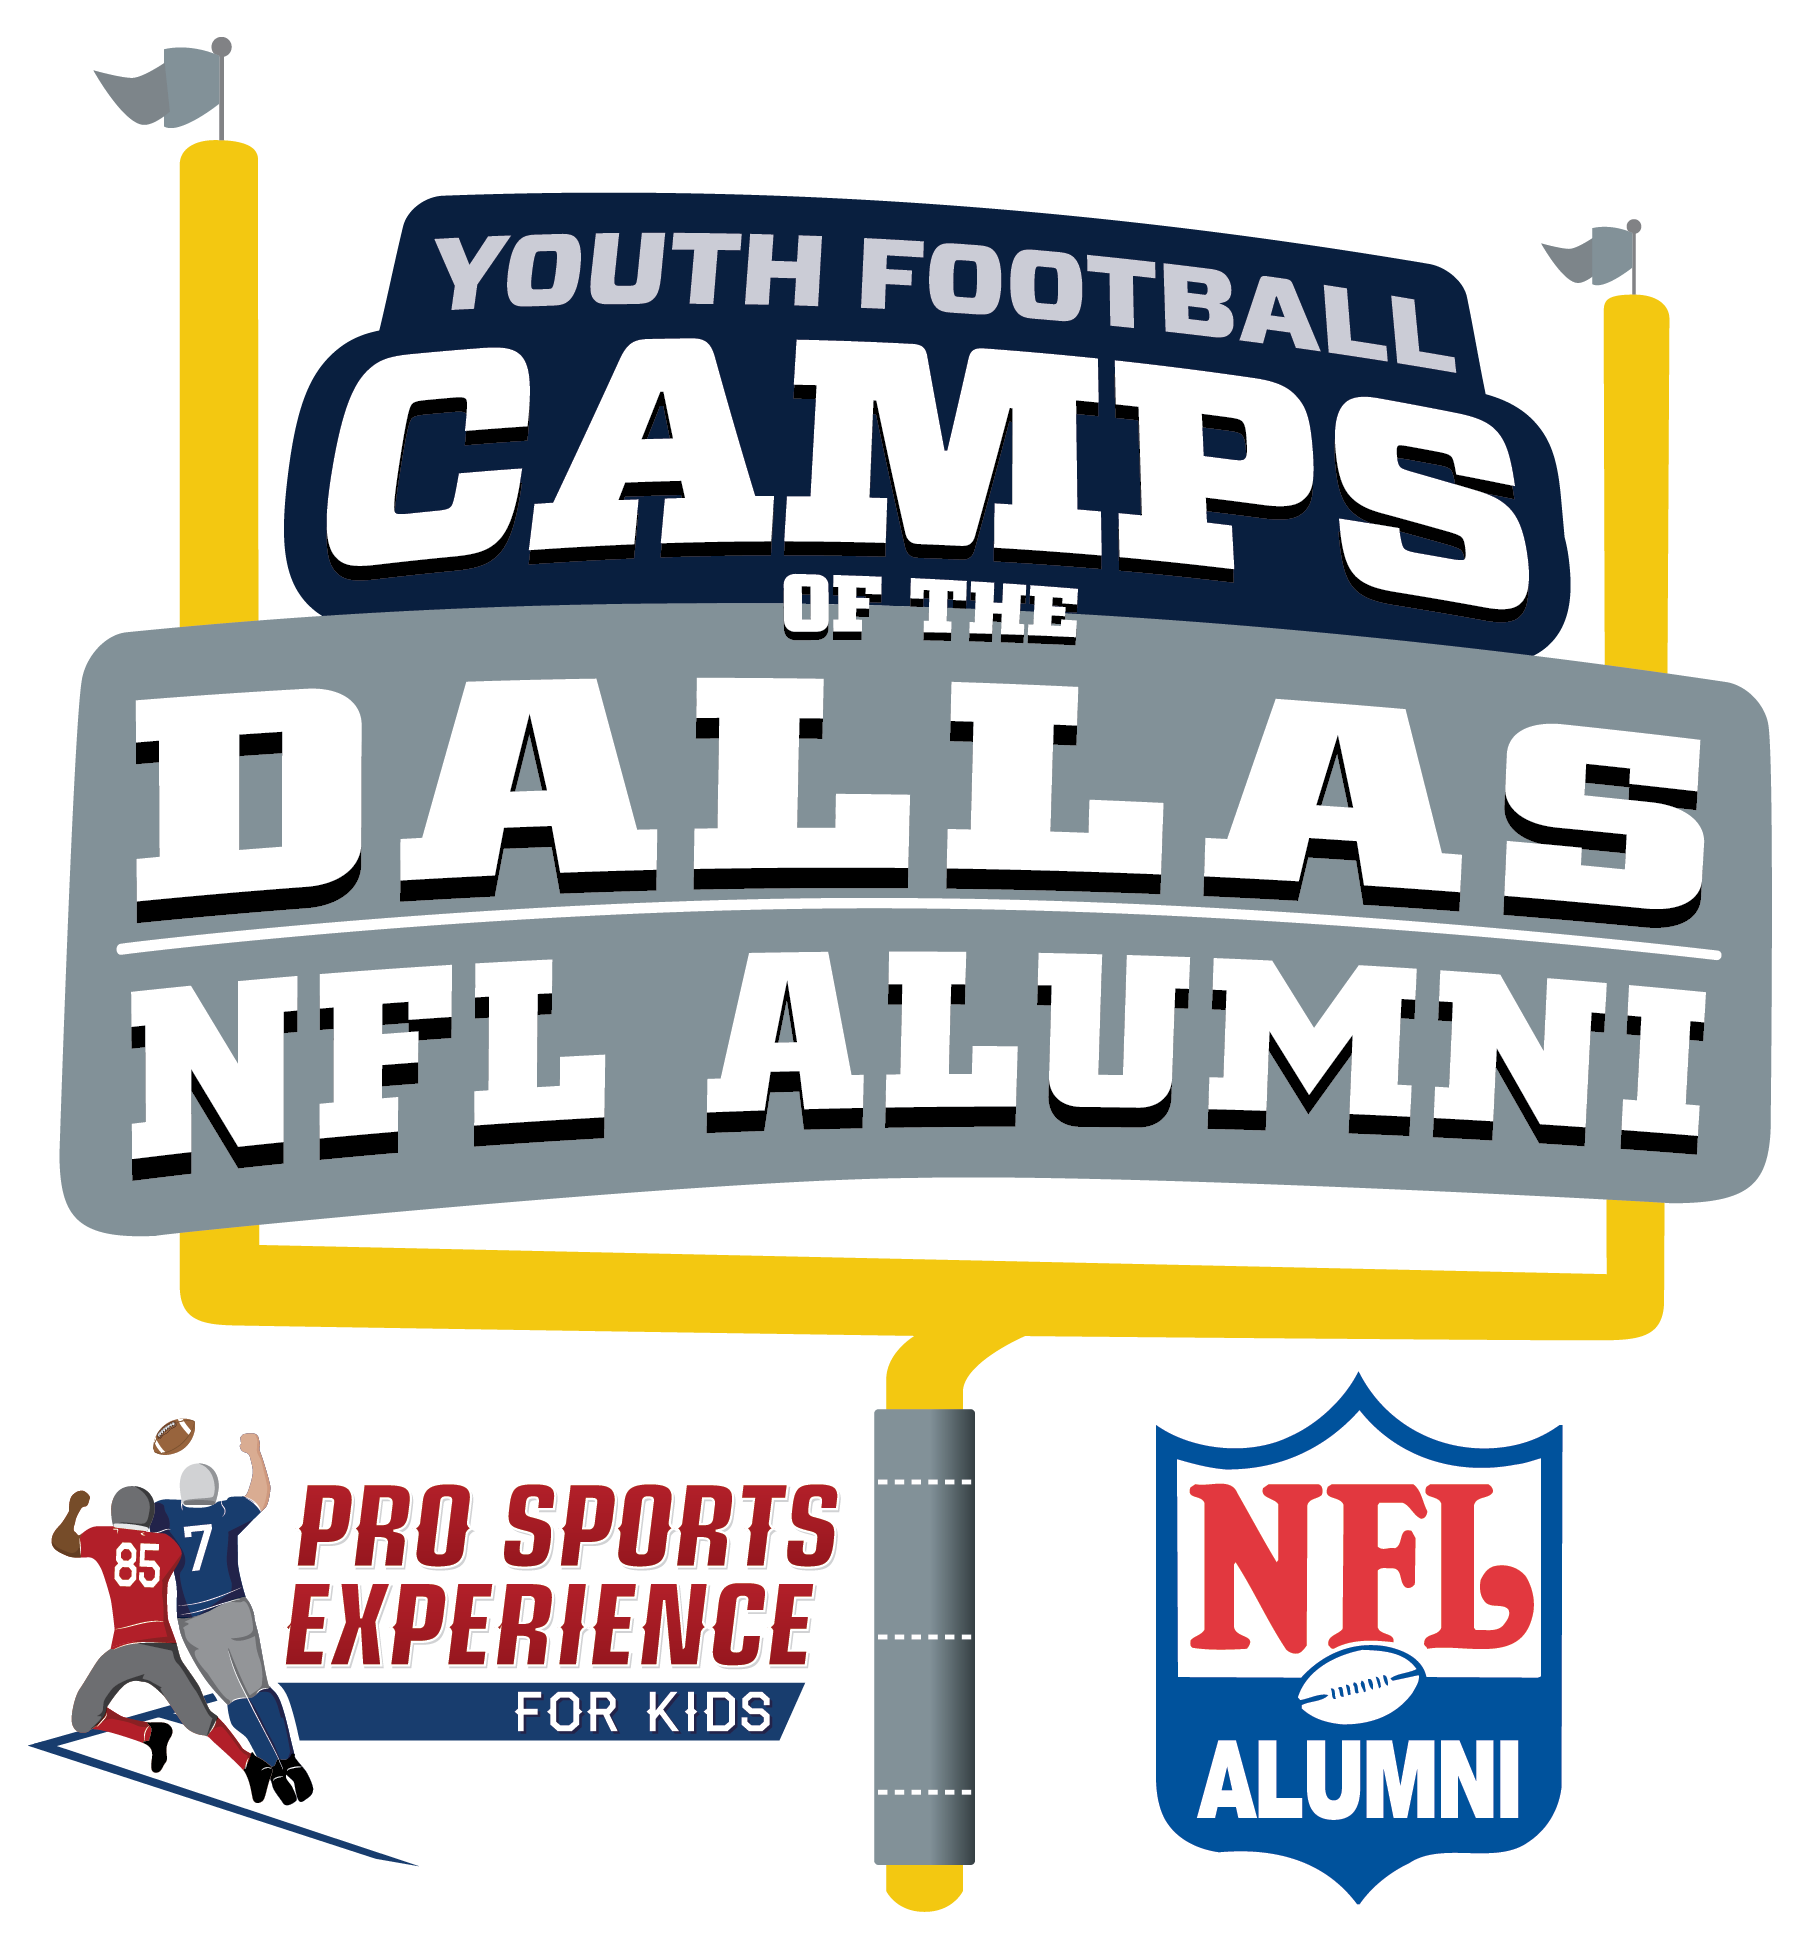 Dallas NFL Alumni Hero Youth Football Camps - Addison